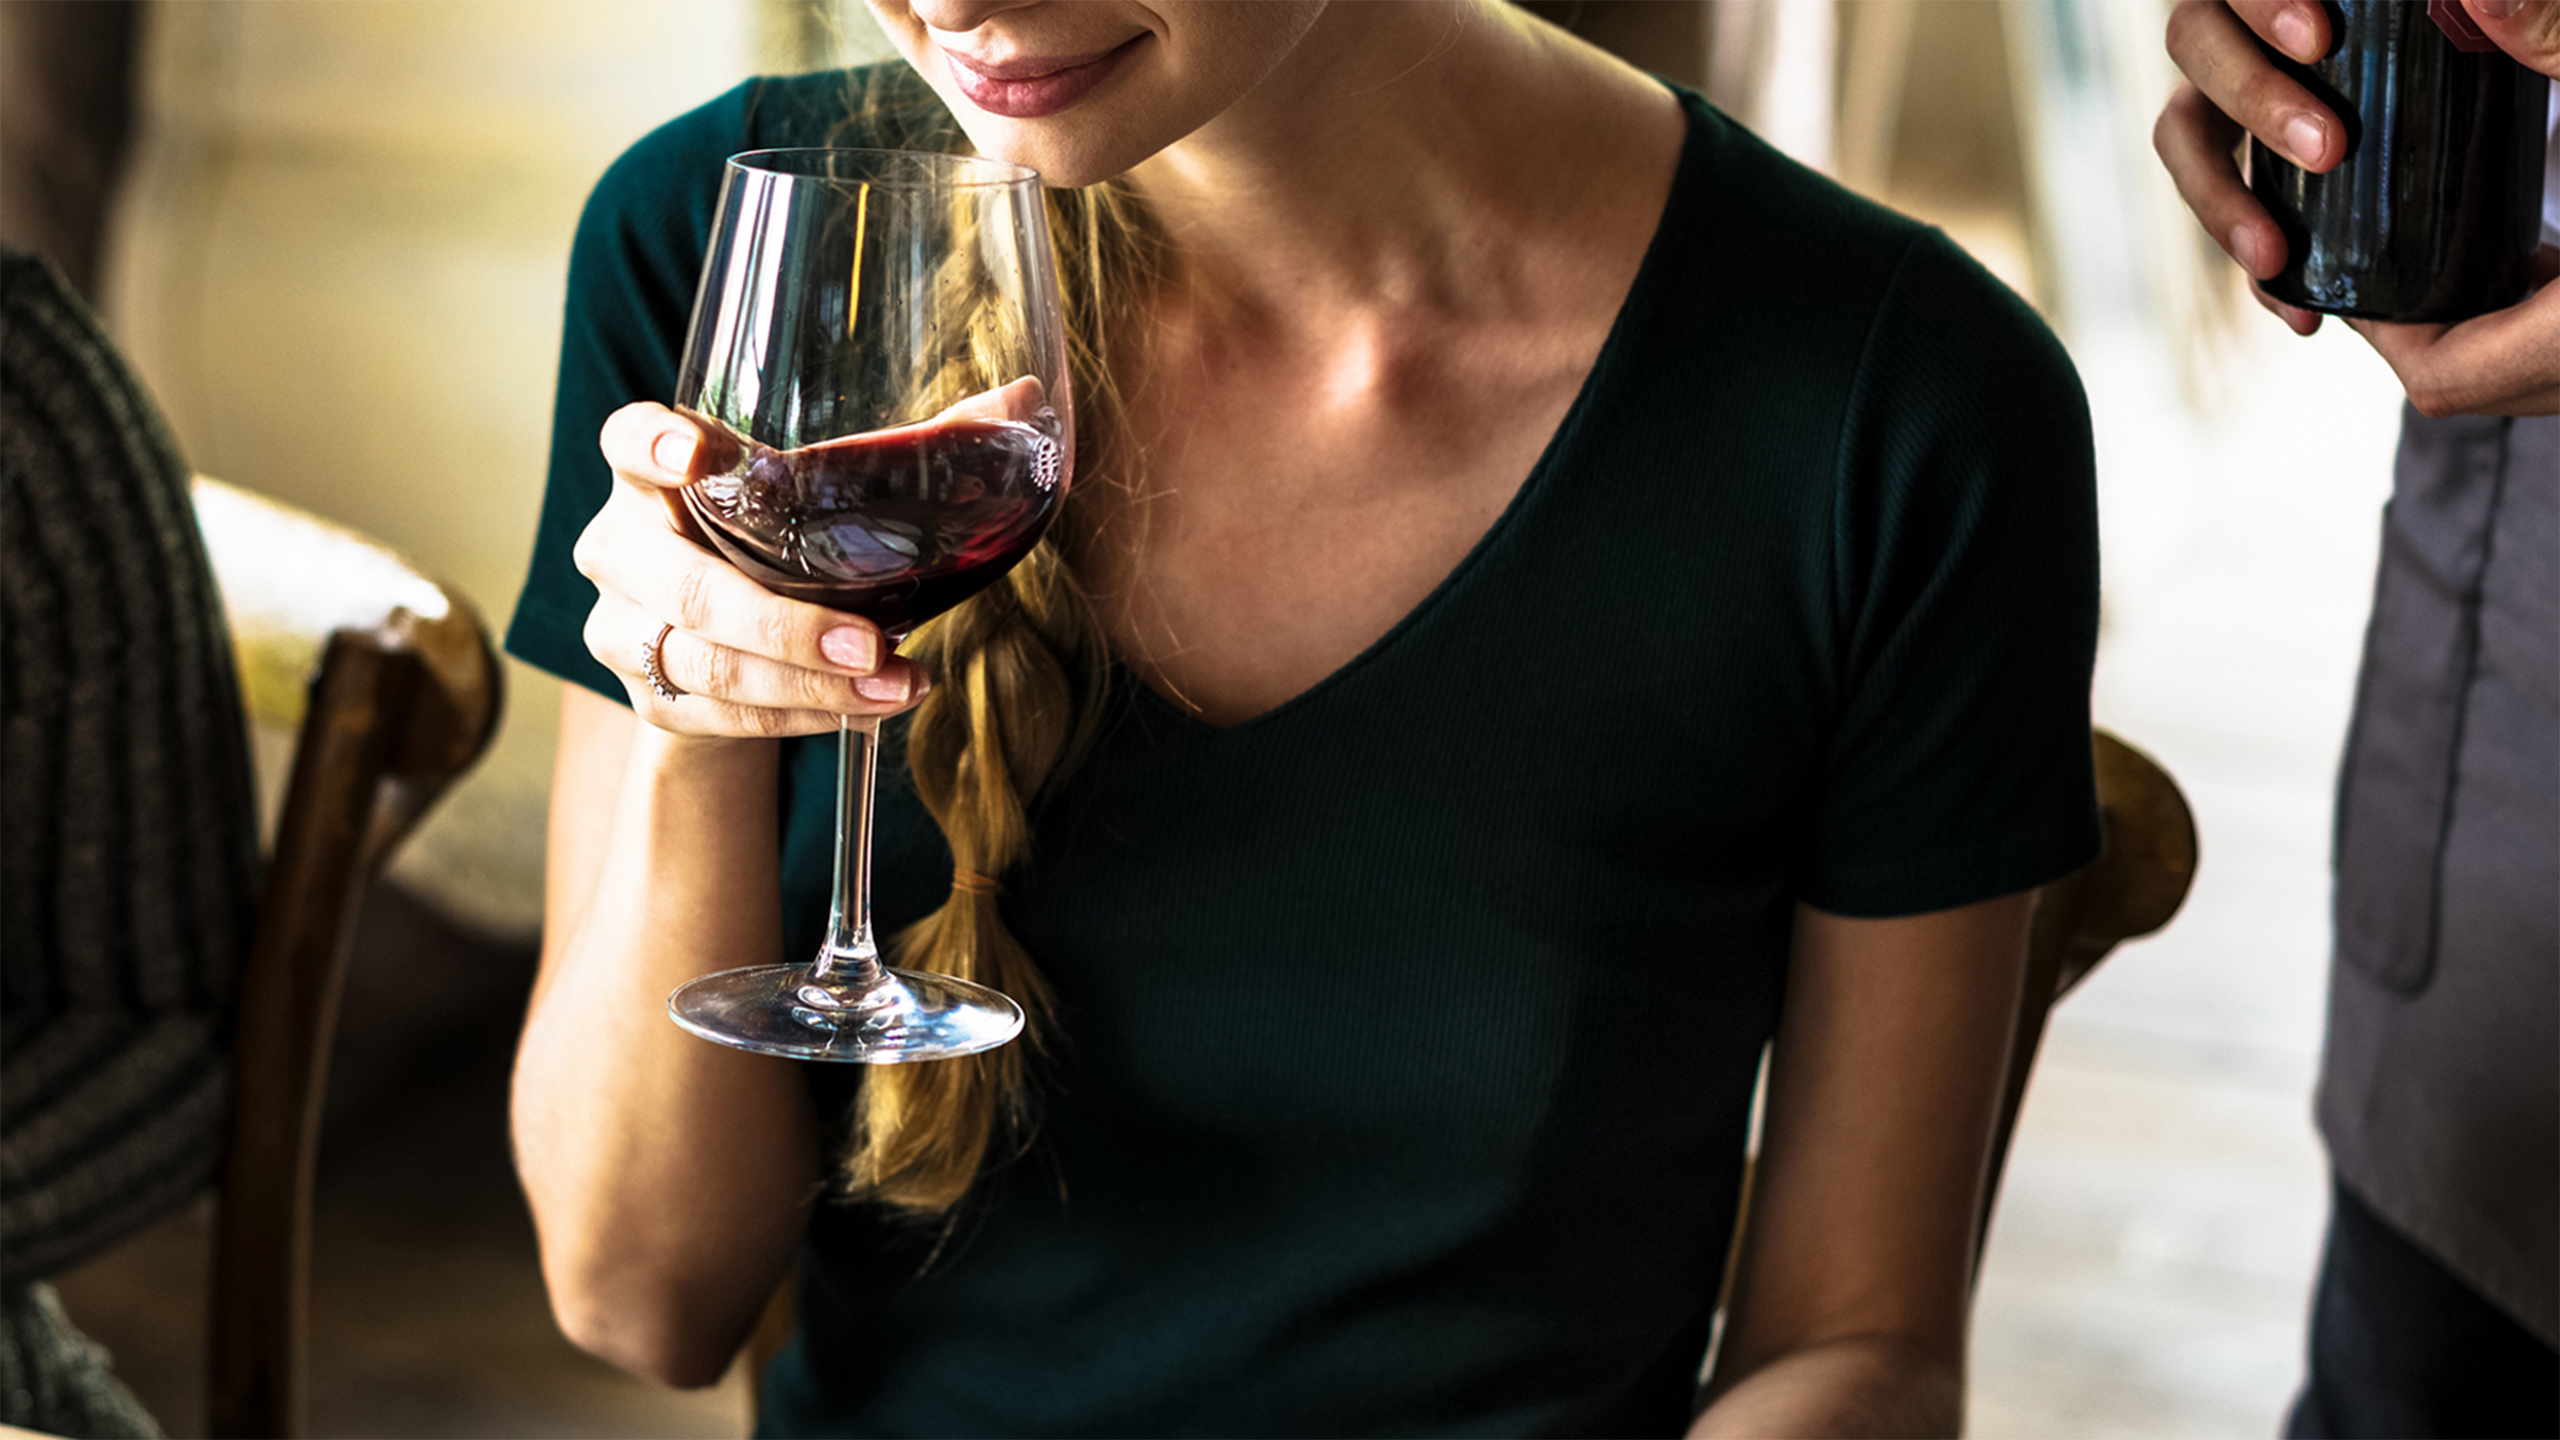 Kantina Skënderbeu, Wine, Project Img 14 - Vatra Agency / Founder & CEO Gerton Bejo